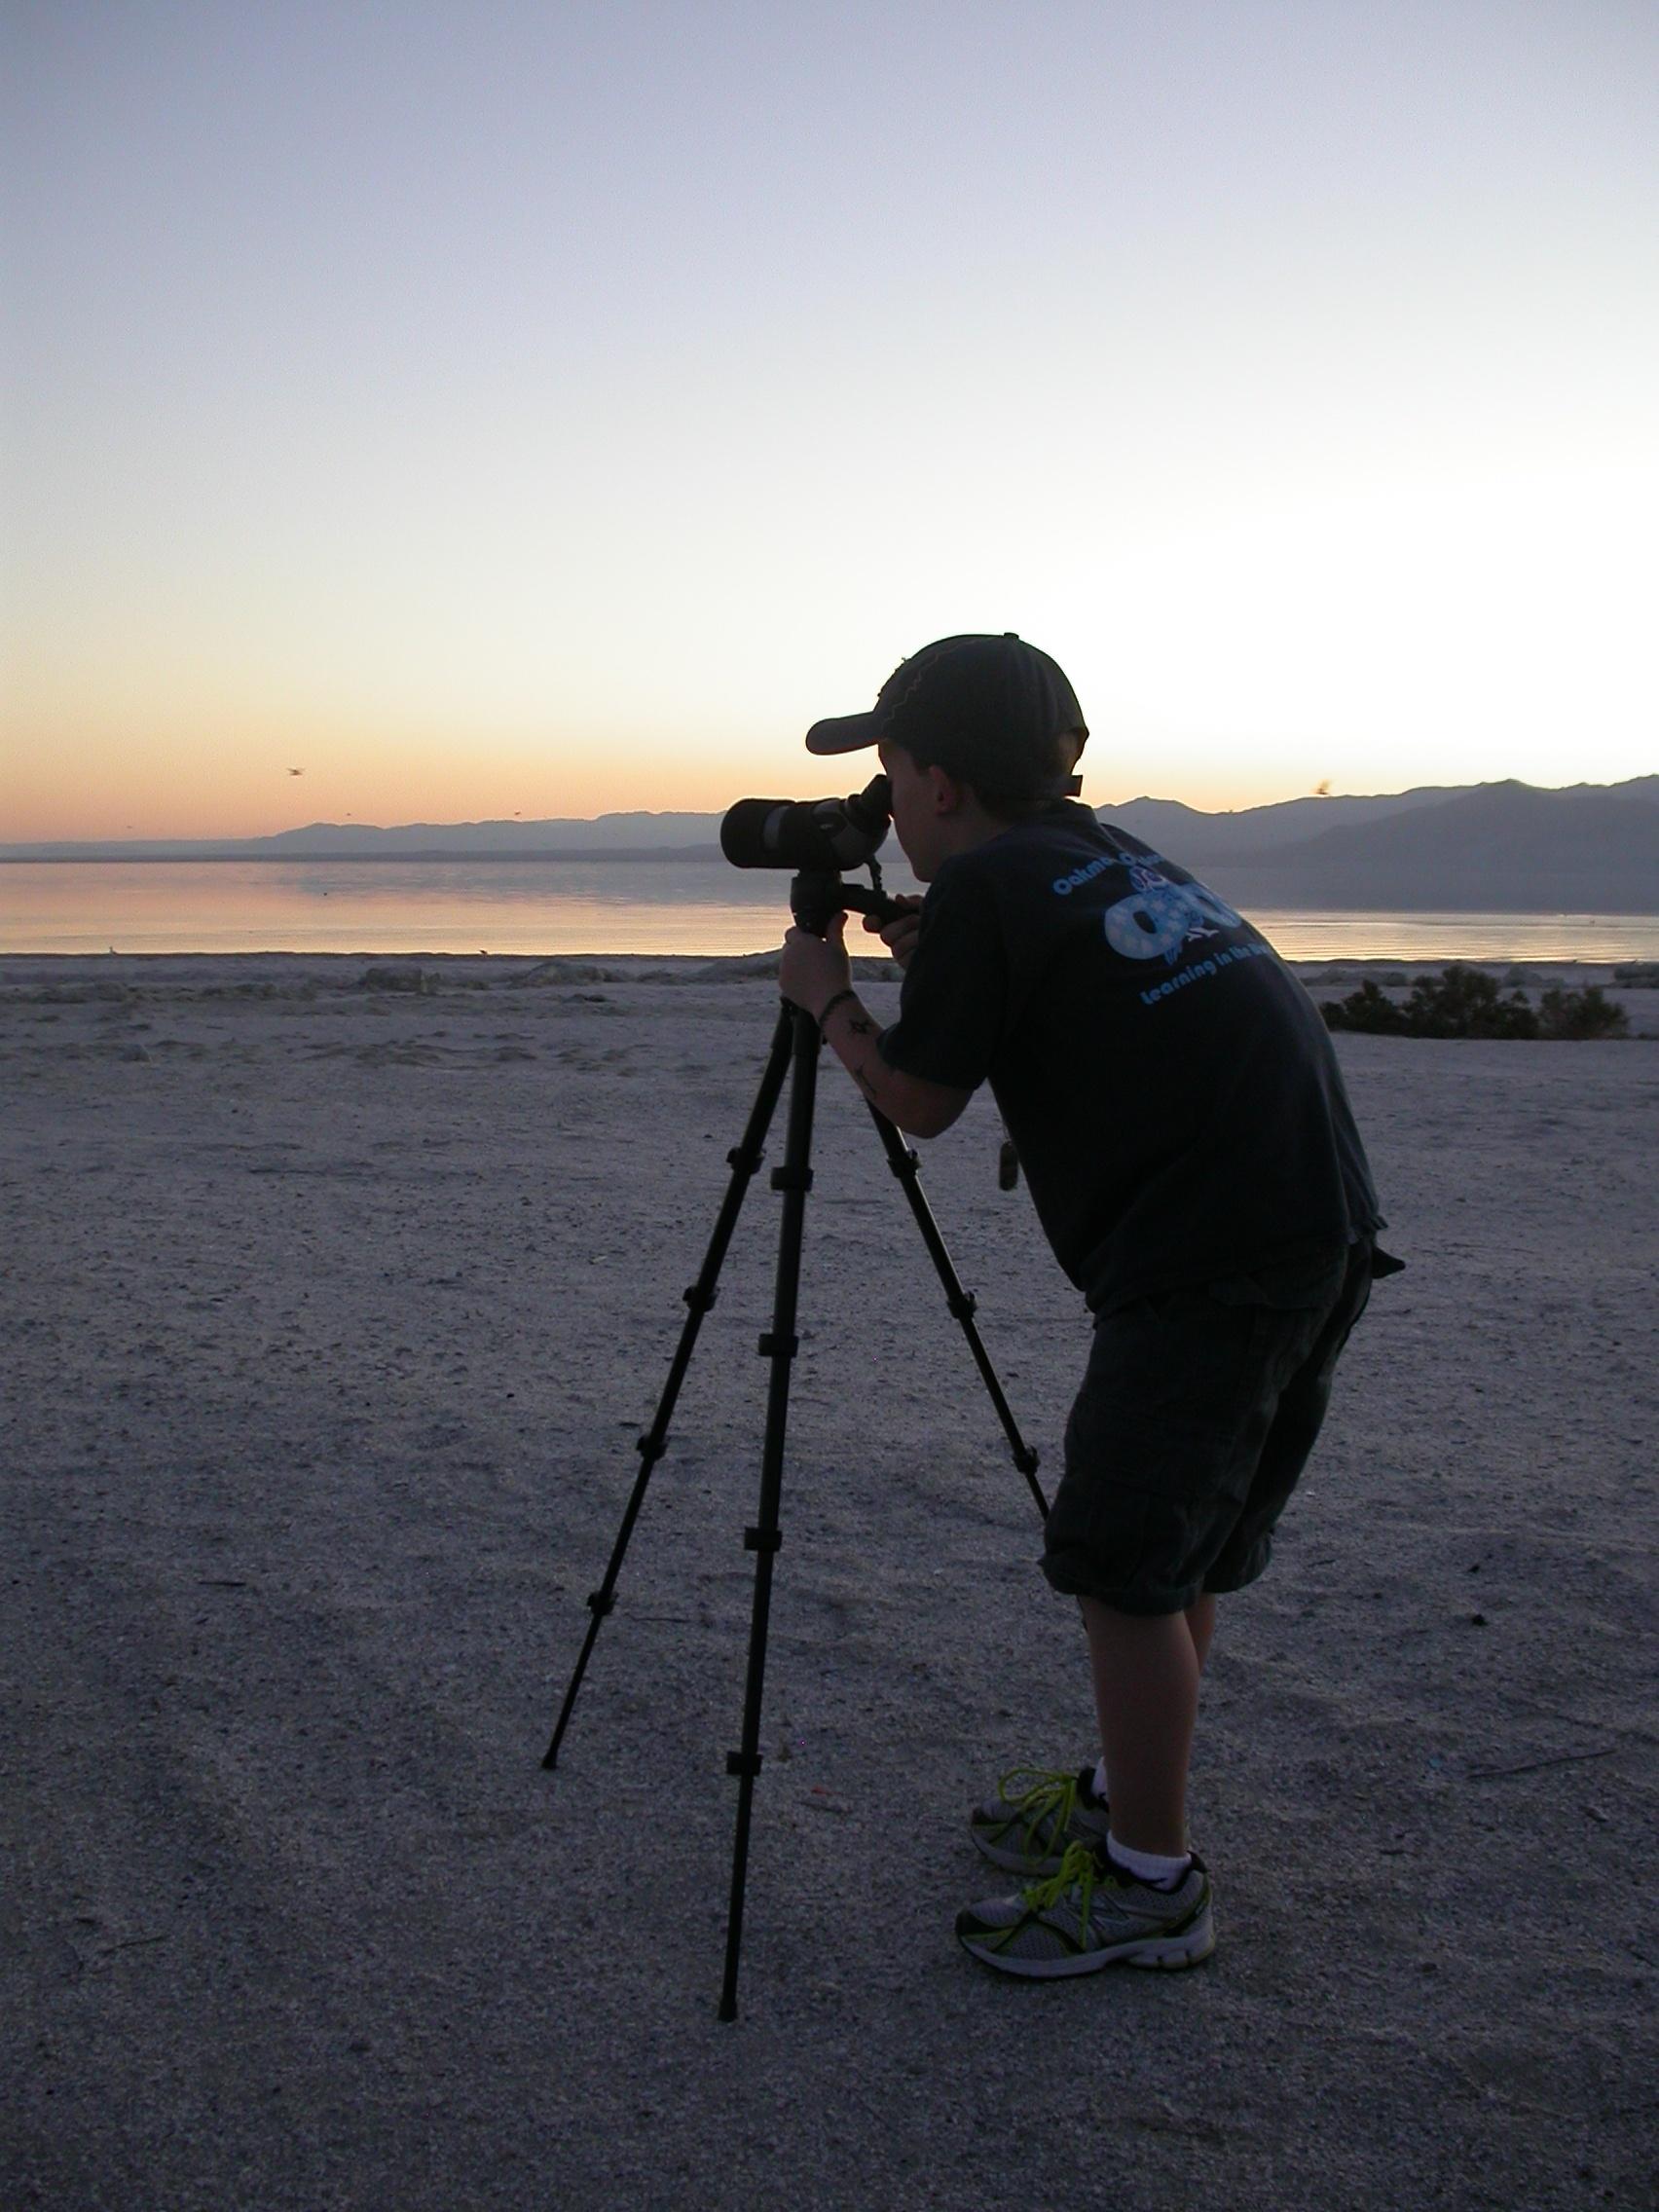 Sunset birding